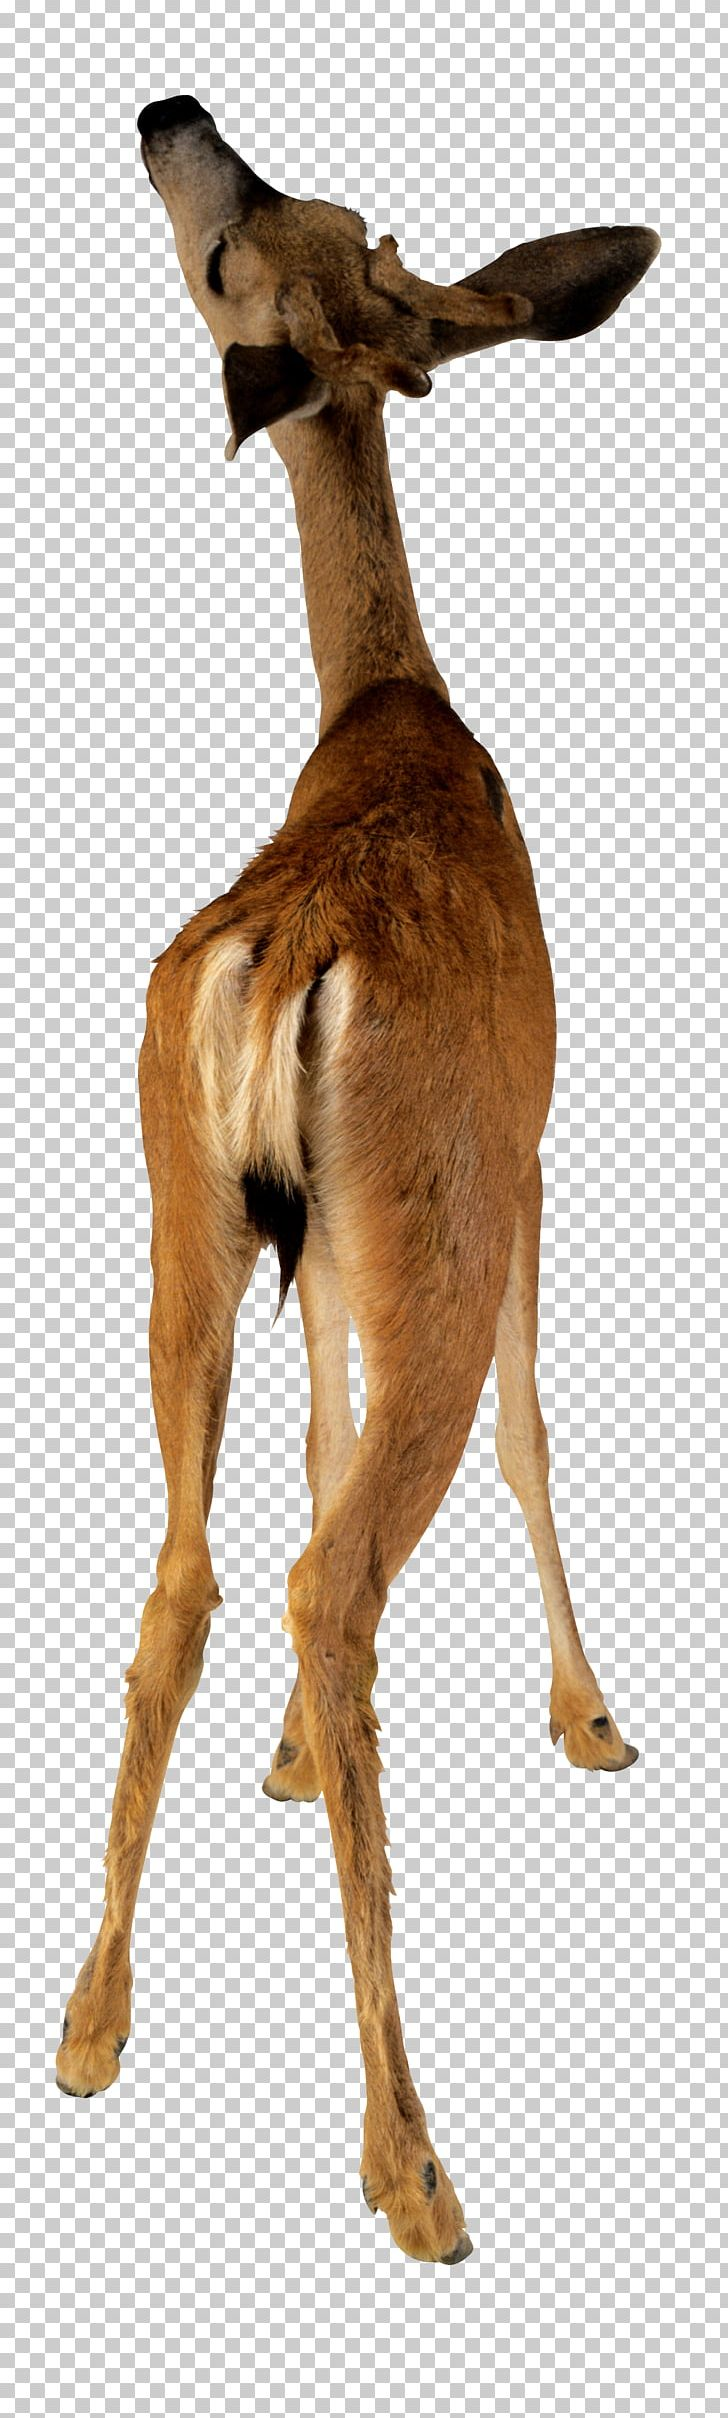 Deer Animal Camel Stock Photography PNG, Clipart, Animals, Antelope, Antler, Christmas Deer, Deer Antlers Free PNG Download